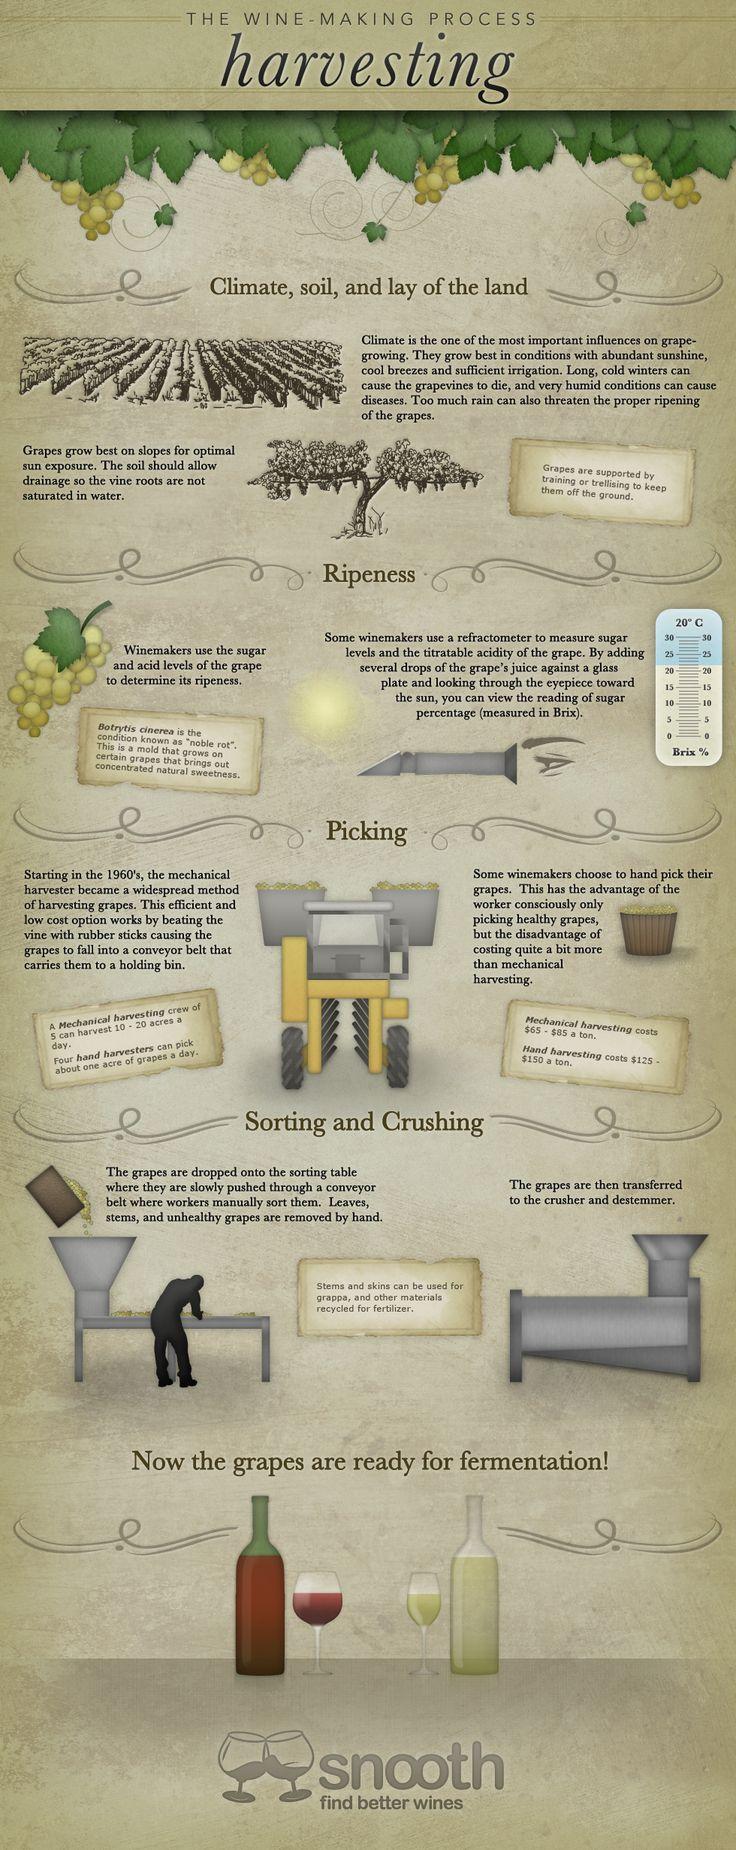 "The Wine Making Process: Wine Harvesting Infographic www.LiquorList.com ""The Marketplace for Adults with Taste!"" @LiquorListcom #LiquorList"